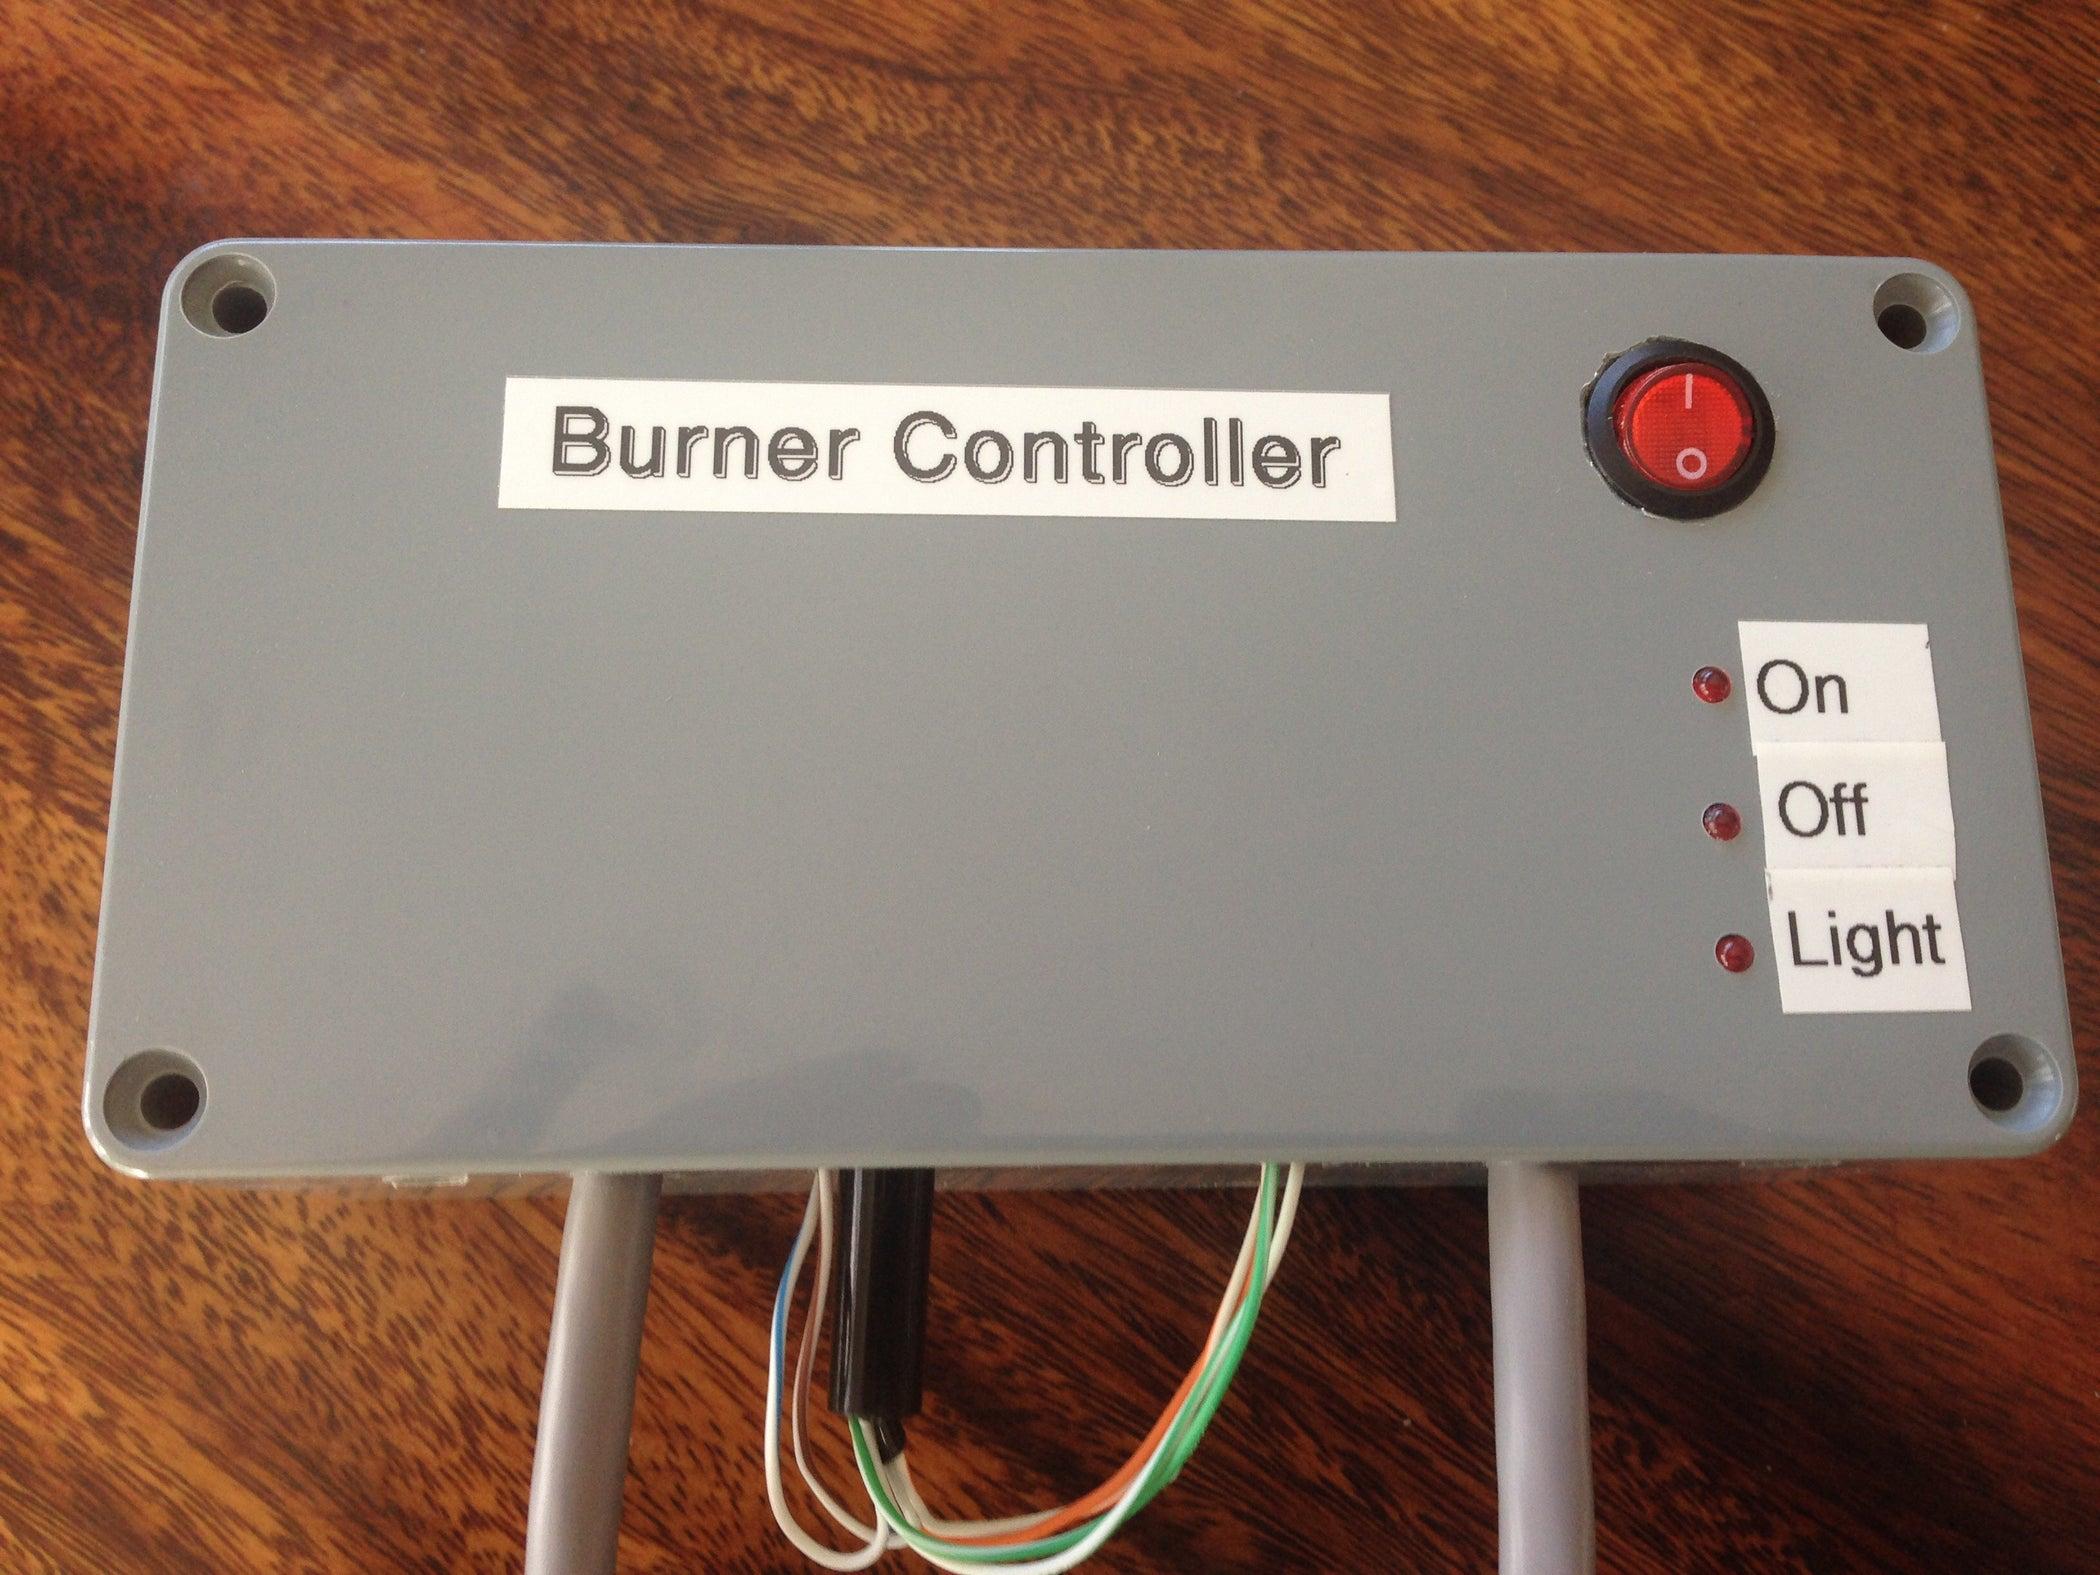 Gas Burner Controller 6 Steps Love Wiring Diagram